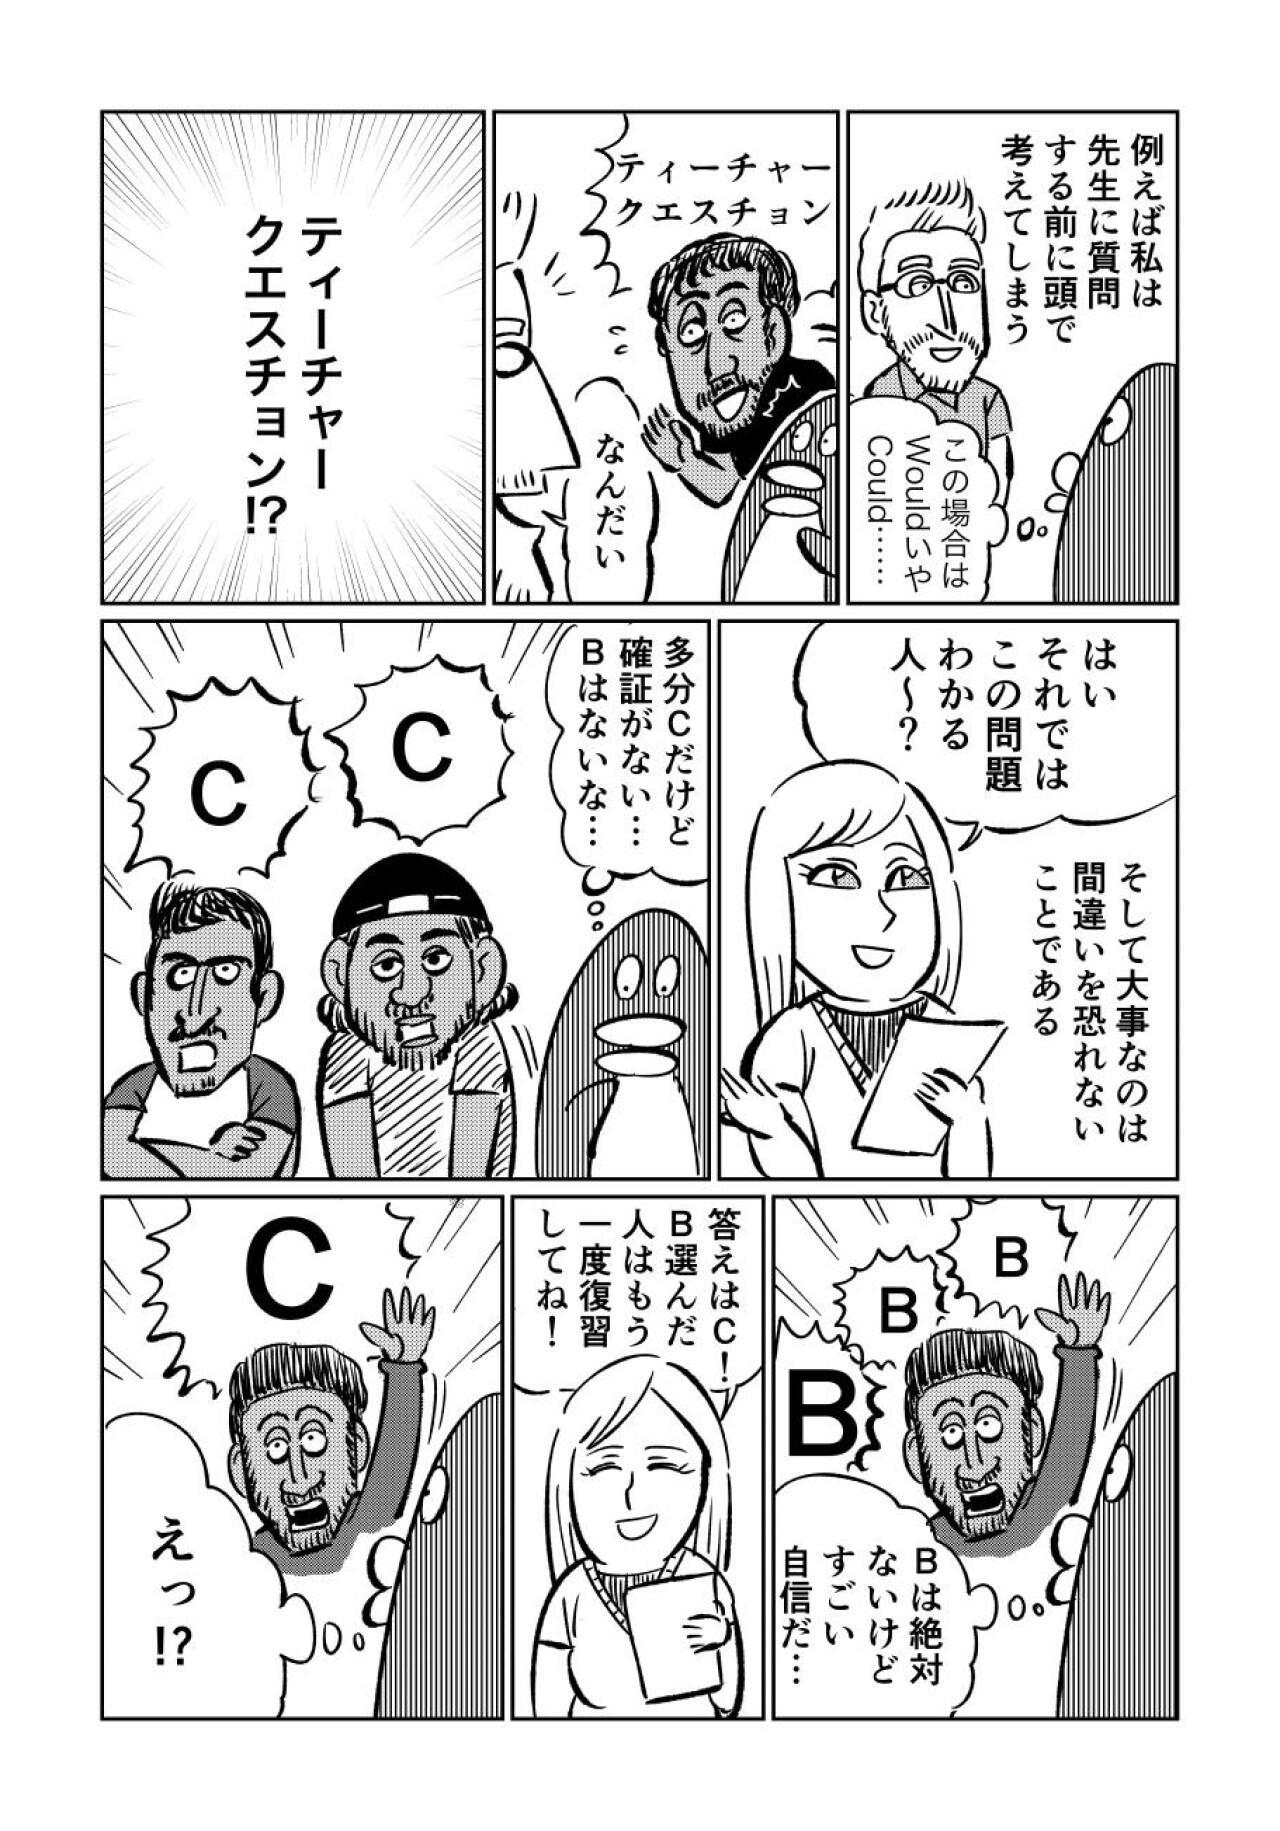 https://www.ryugaku.co.jp/column/images/34sai7_2_1280.jpg